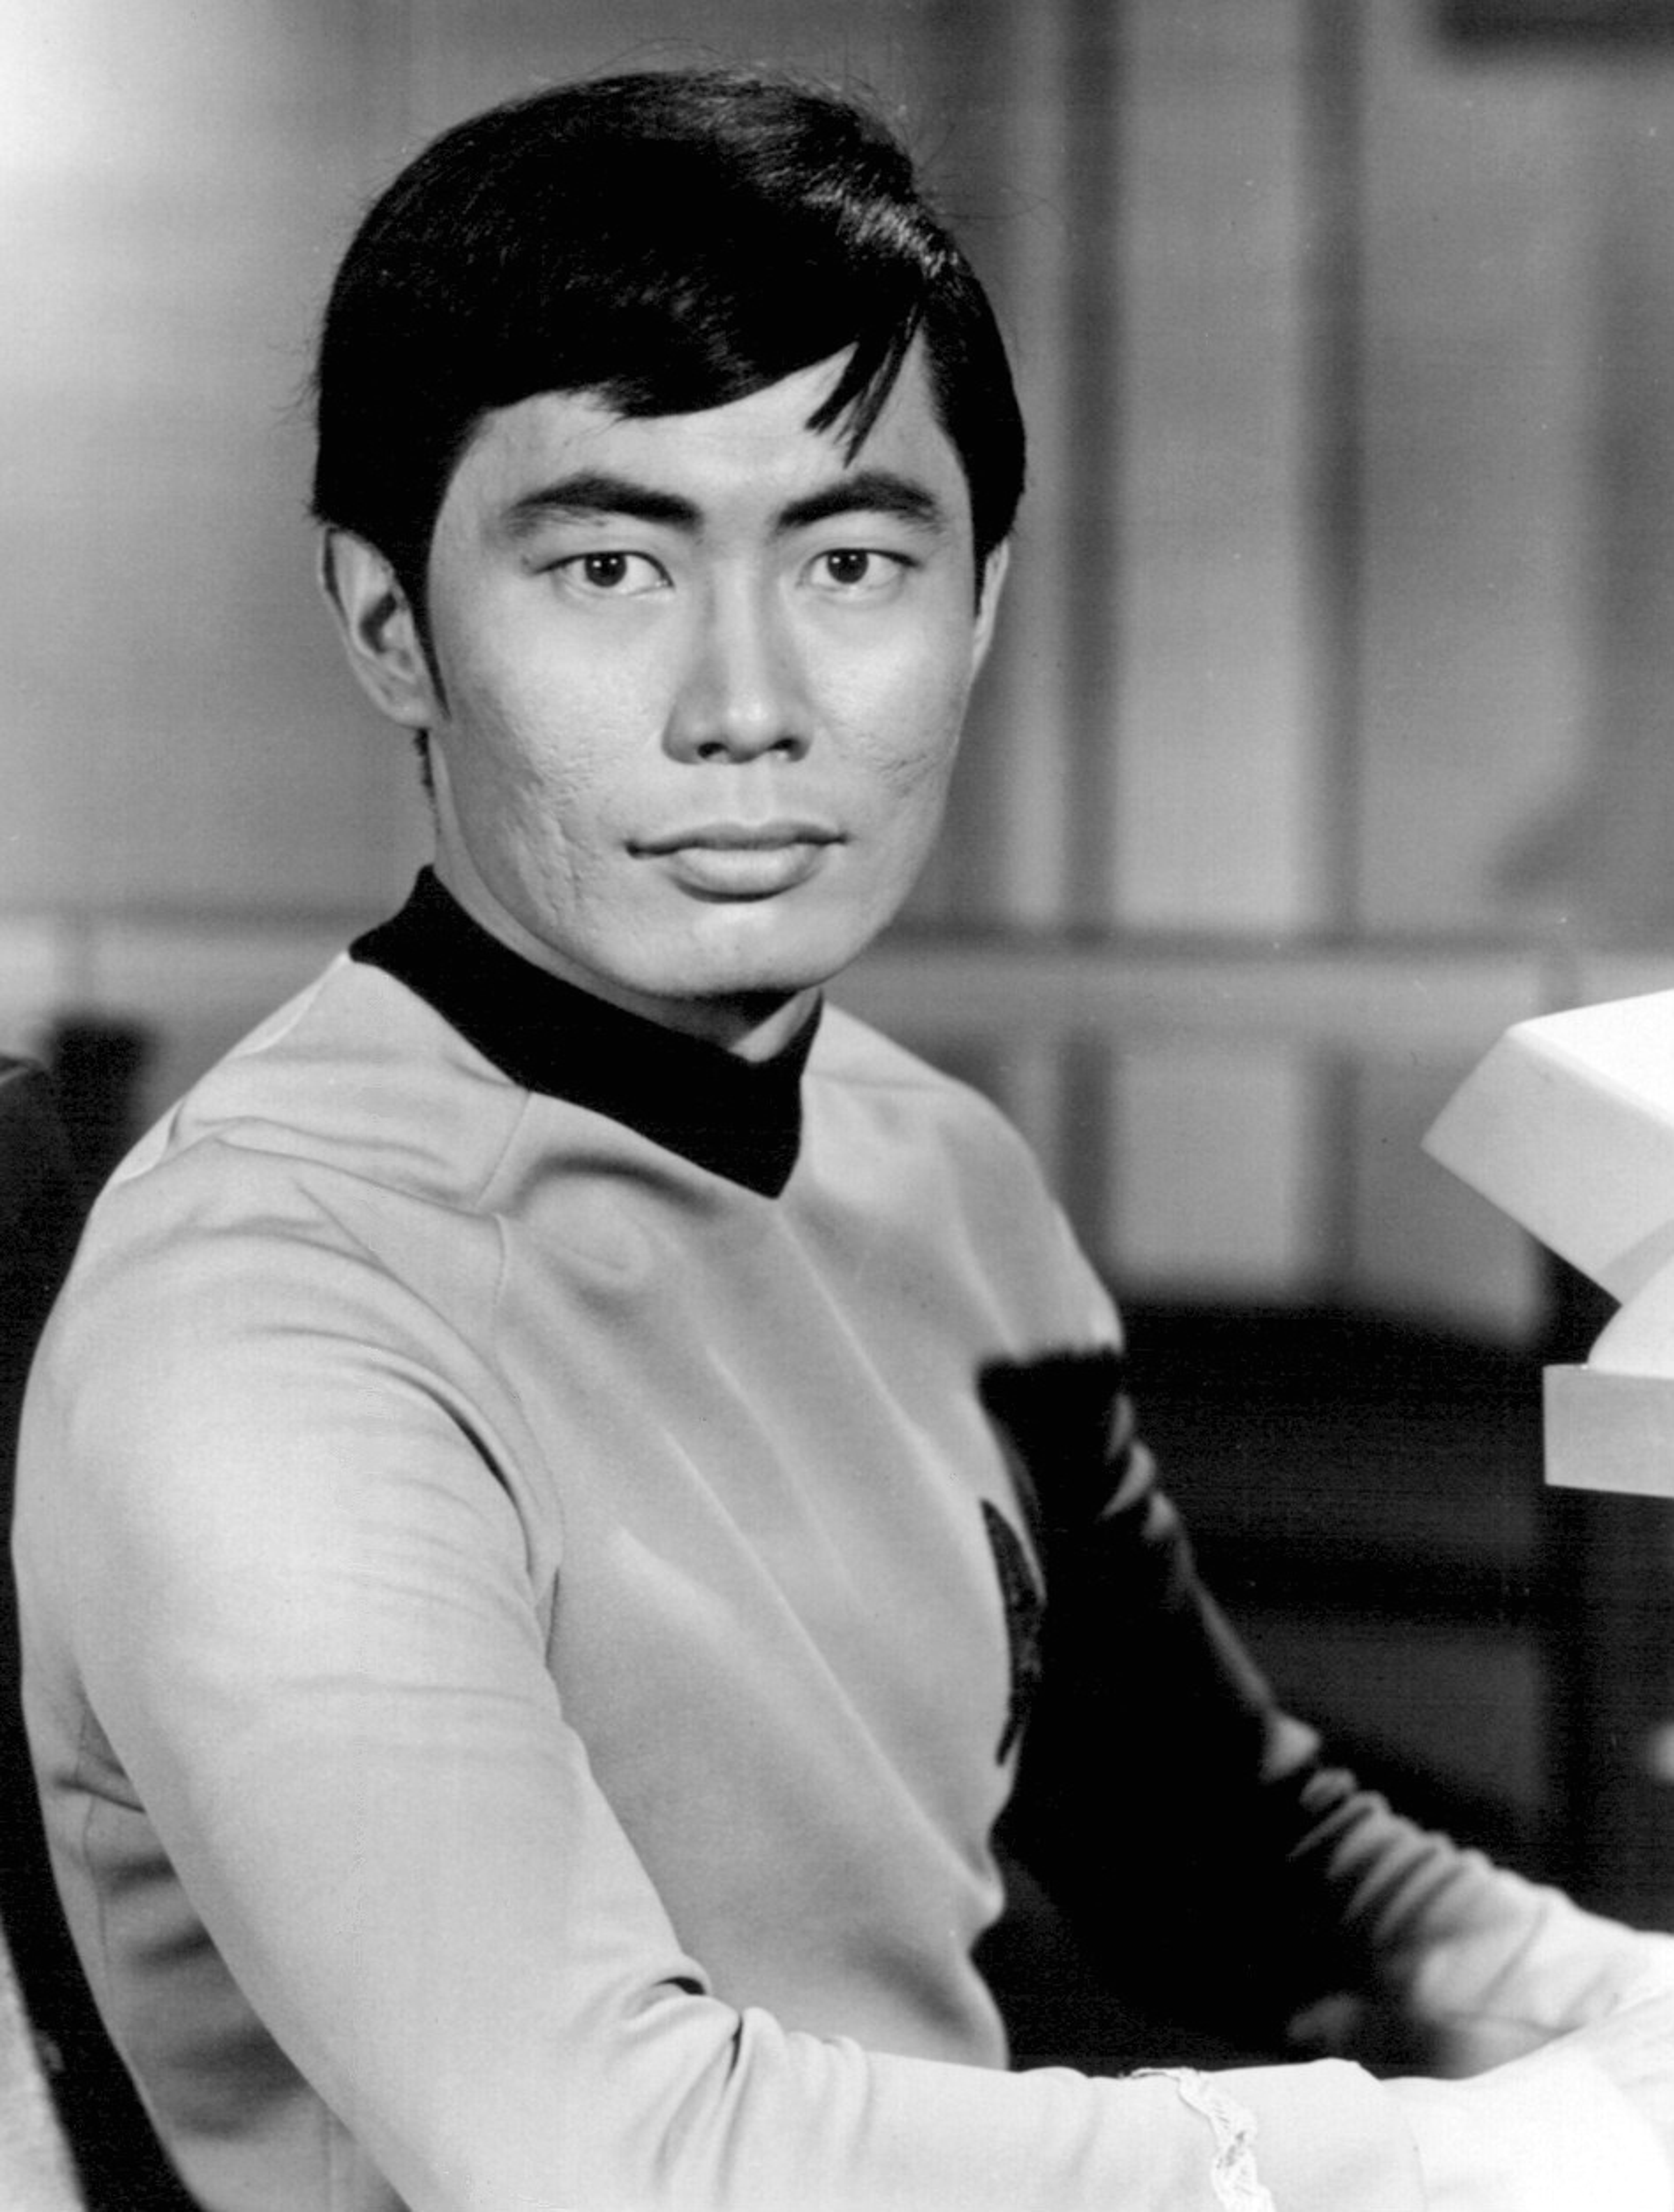 https://i2.wp.com/upload.wikimedia.org/wikipedia/commons/f/f8/George_Takei_Sulu_Star_Trek.JPG